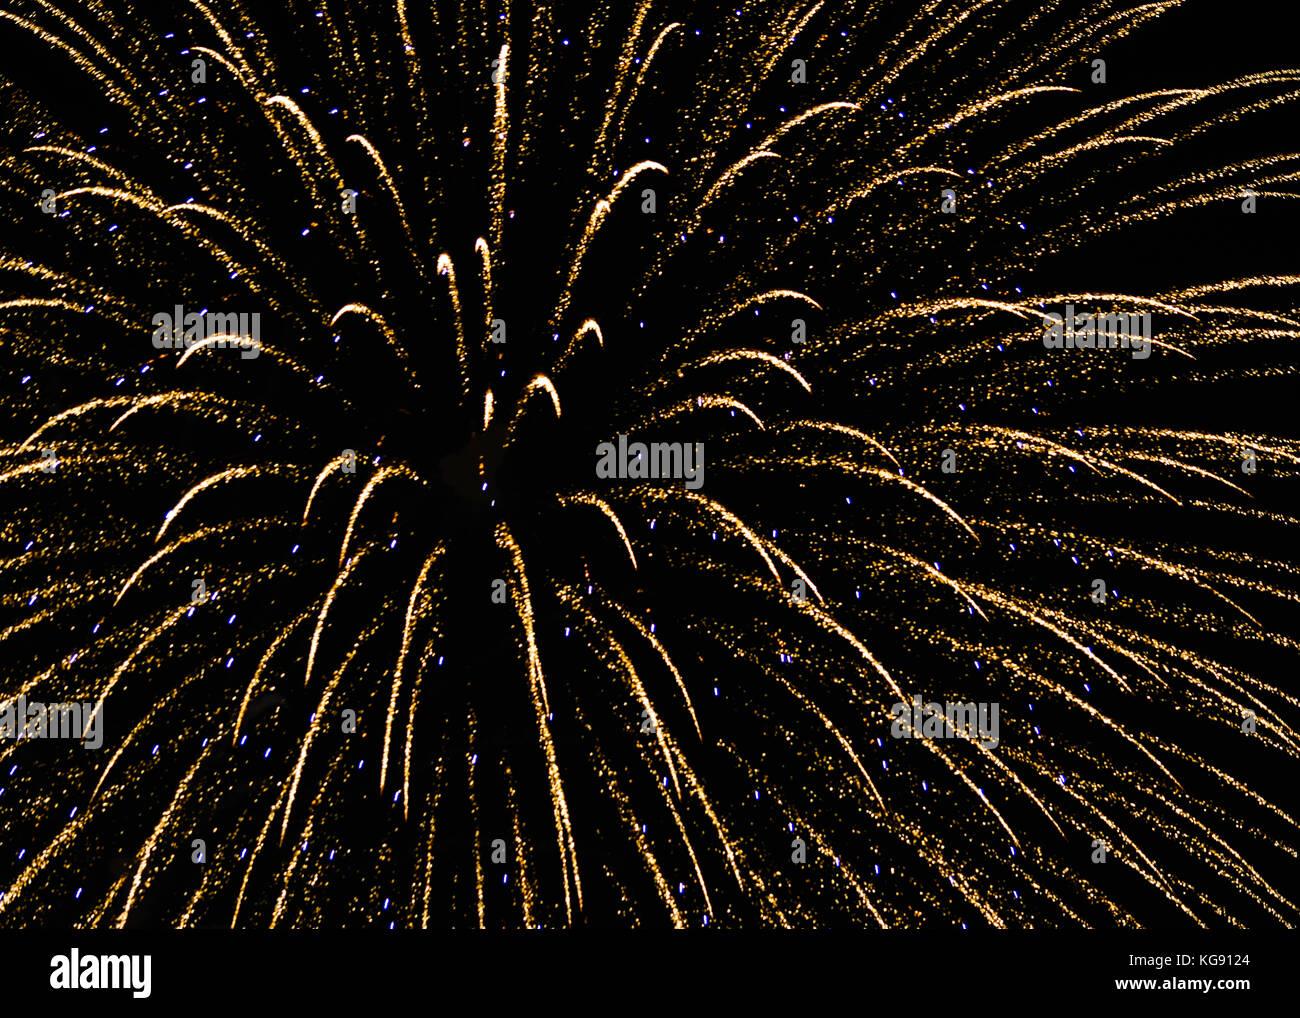 Nighttime fireworks show in Poulsbo, Washington on July Third Stock Photo